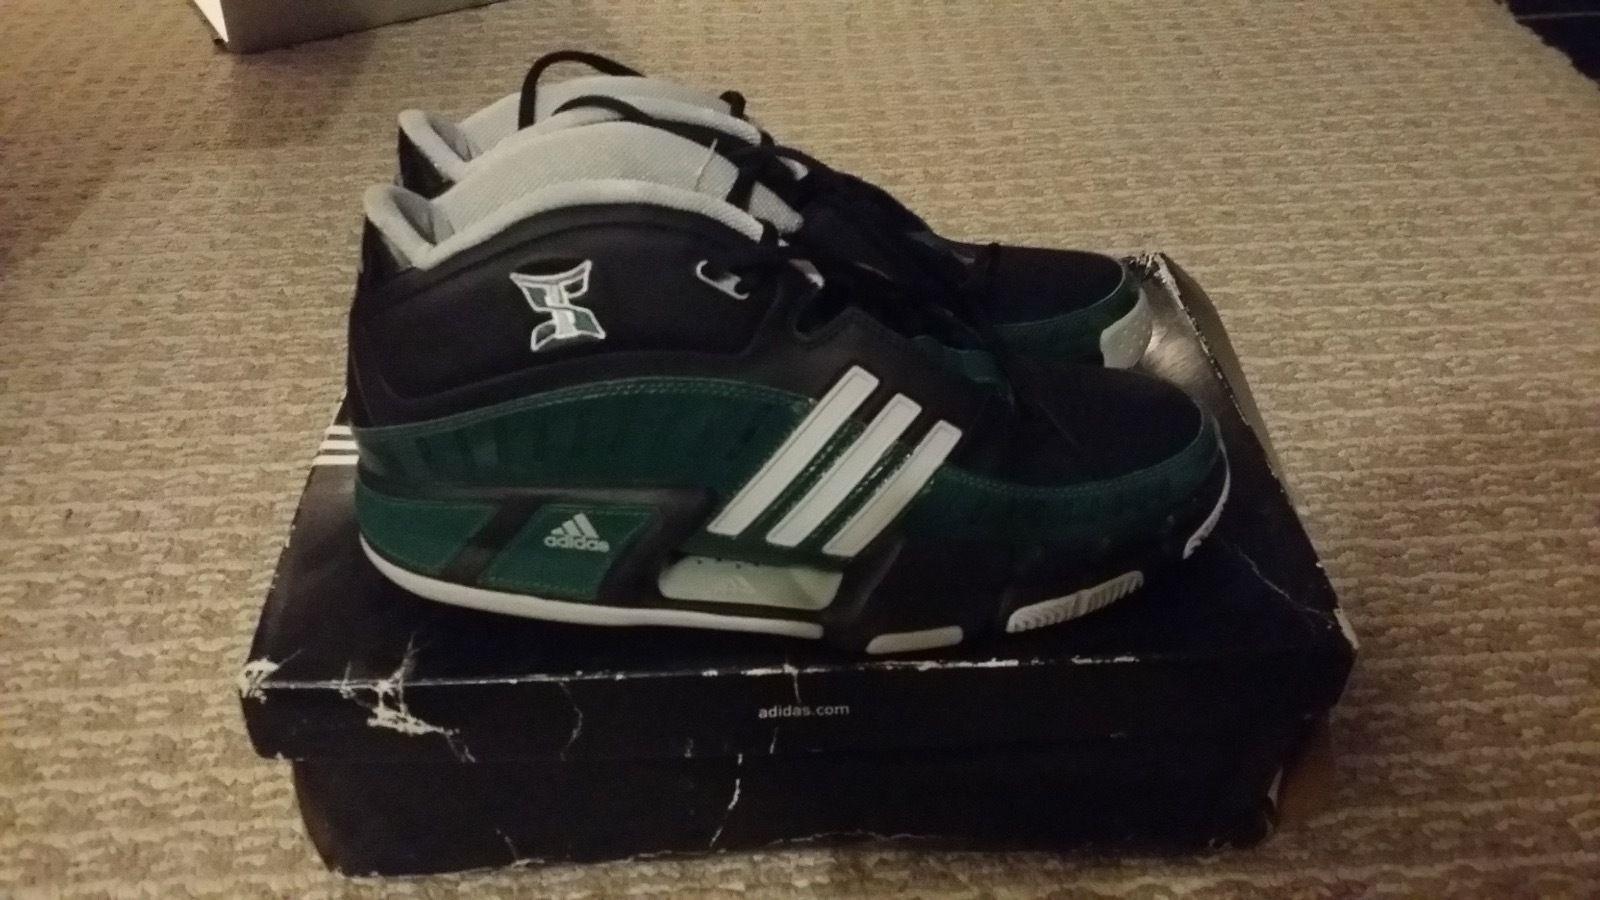 Adidas professore nba verde promo scarpe da basket verde nba / nero Uomo 46 0e40d1